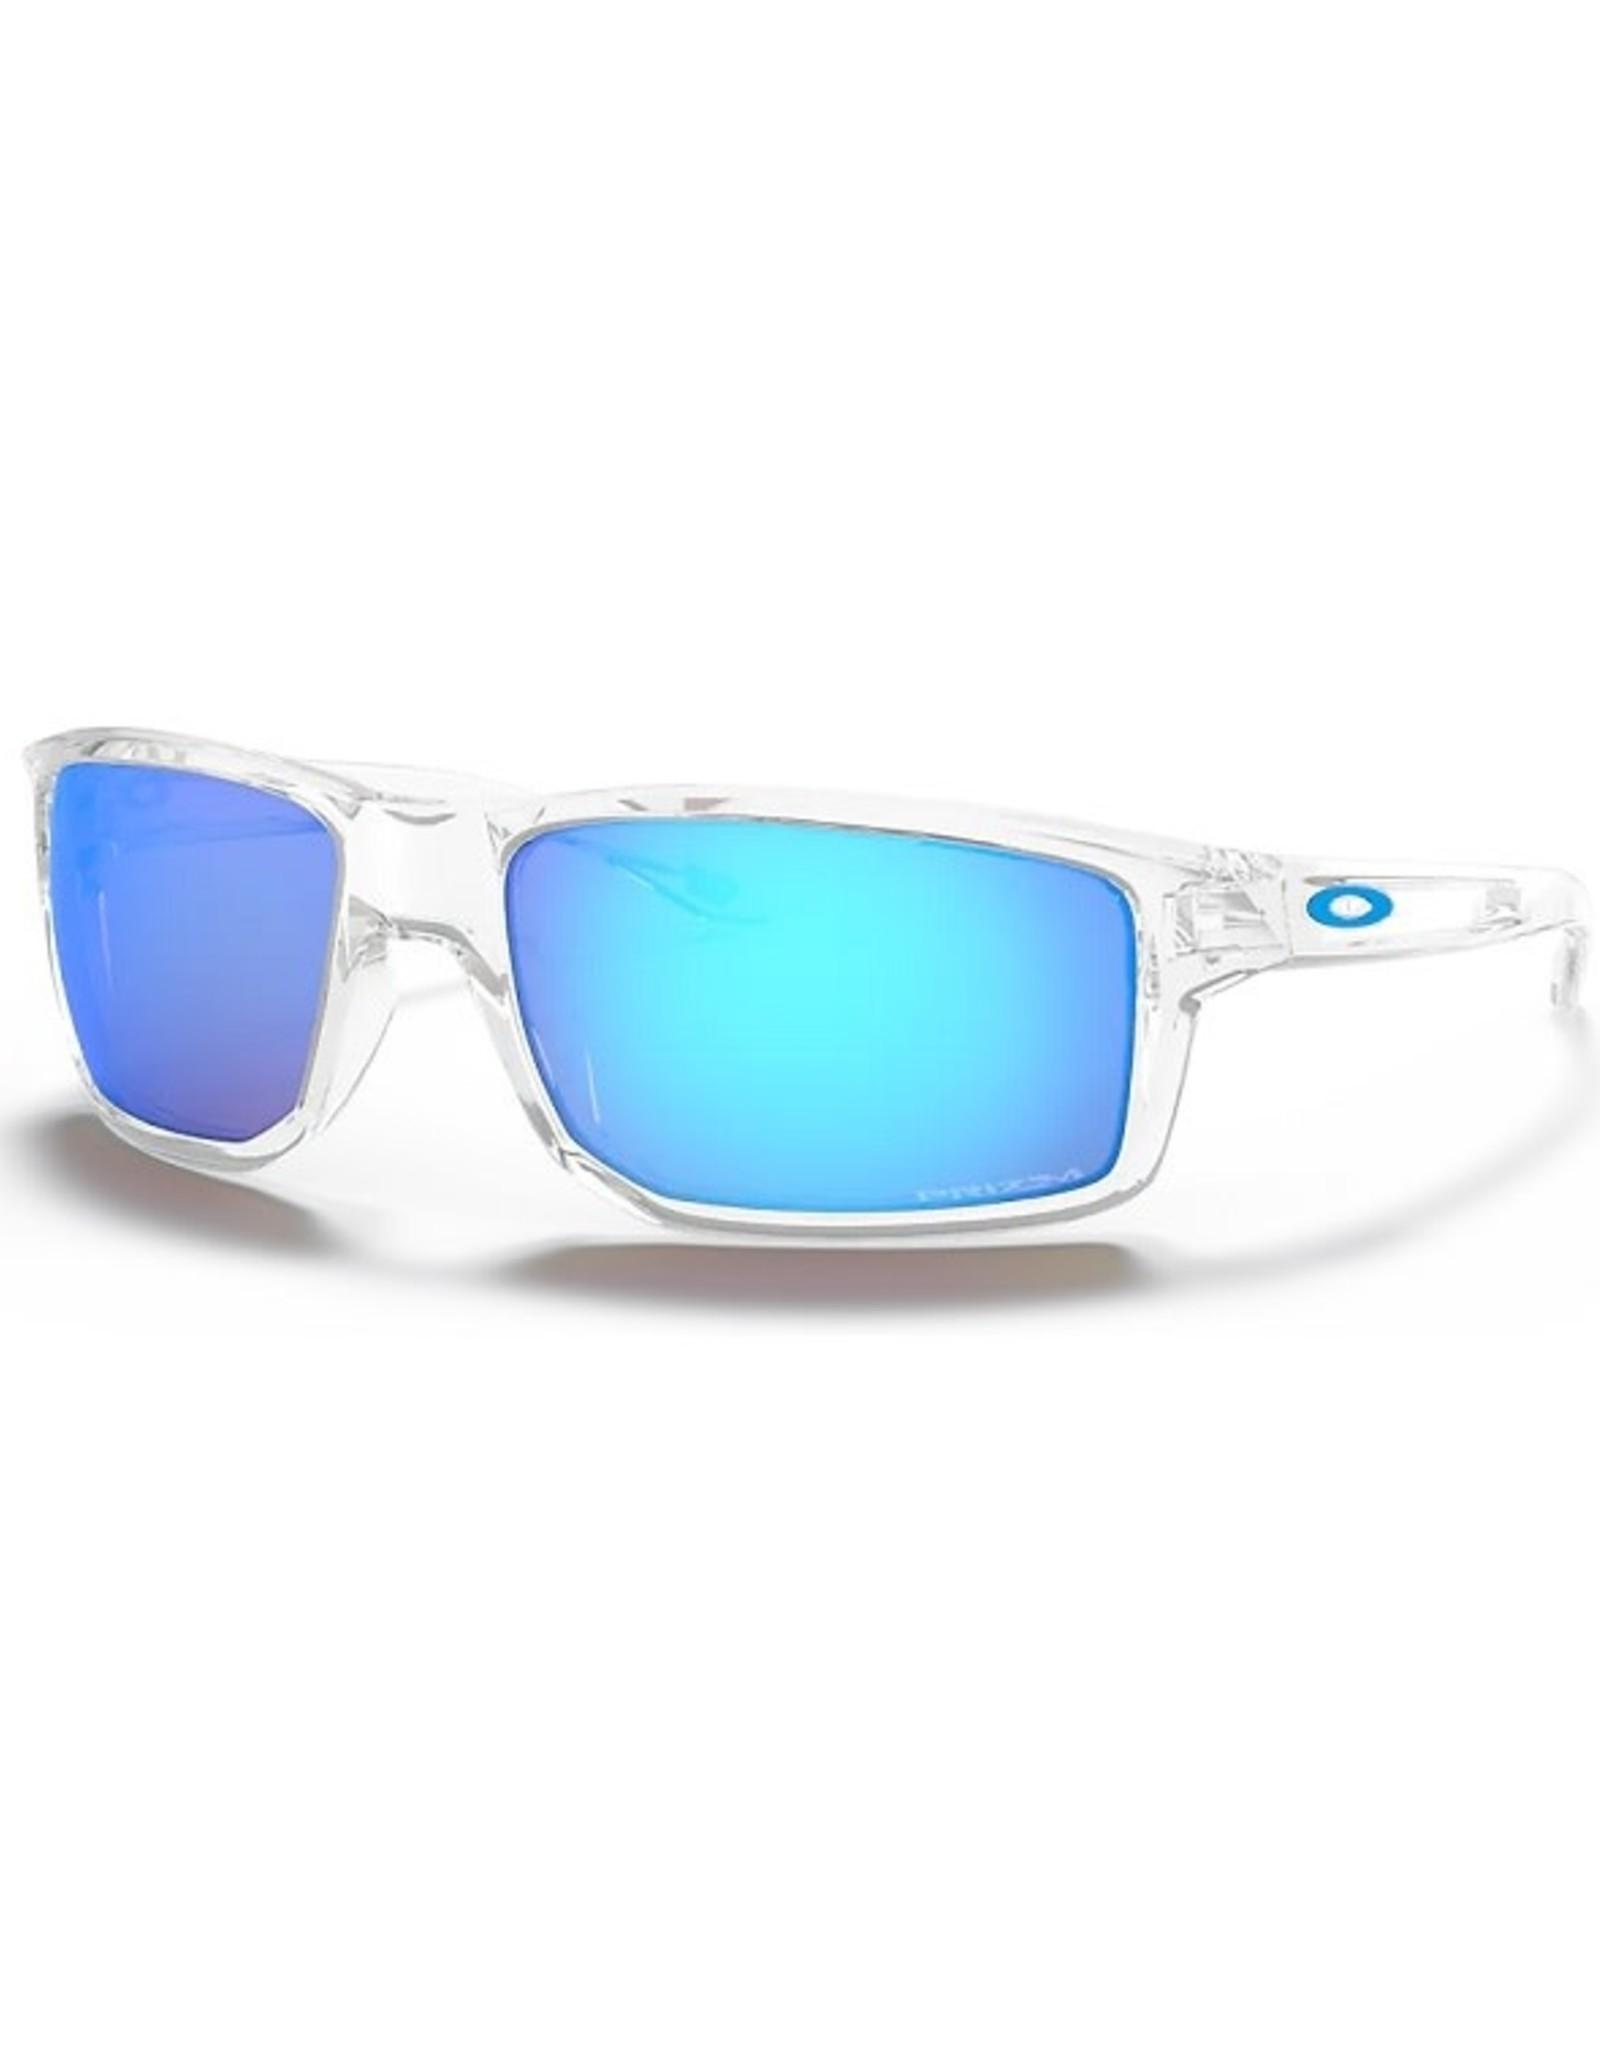 Oakley GIBSTON Polished Clear, Prizm Sapphire Iridium